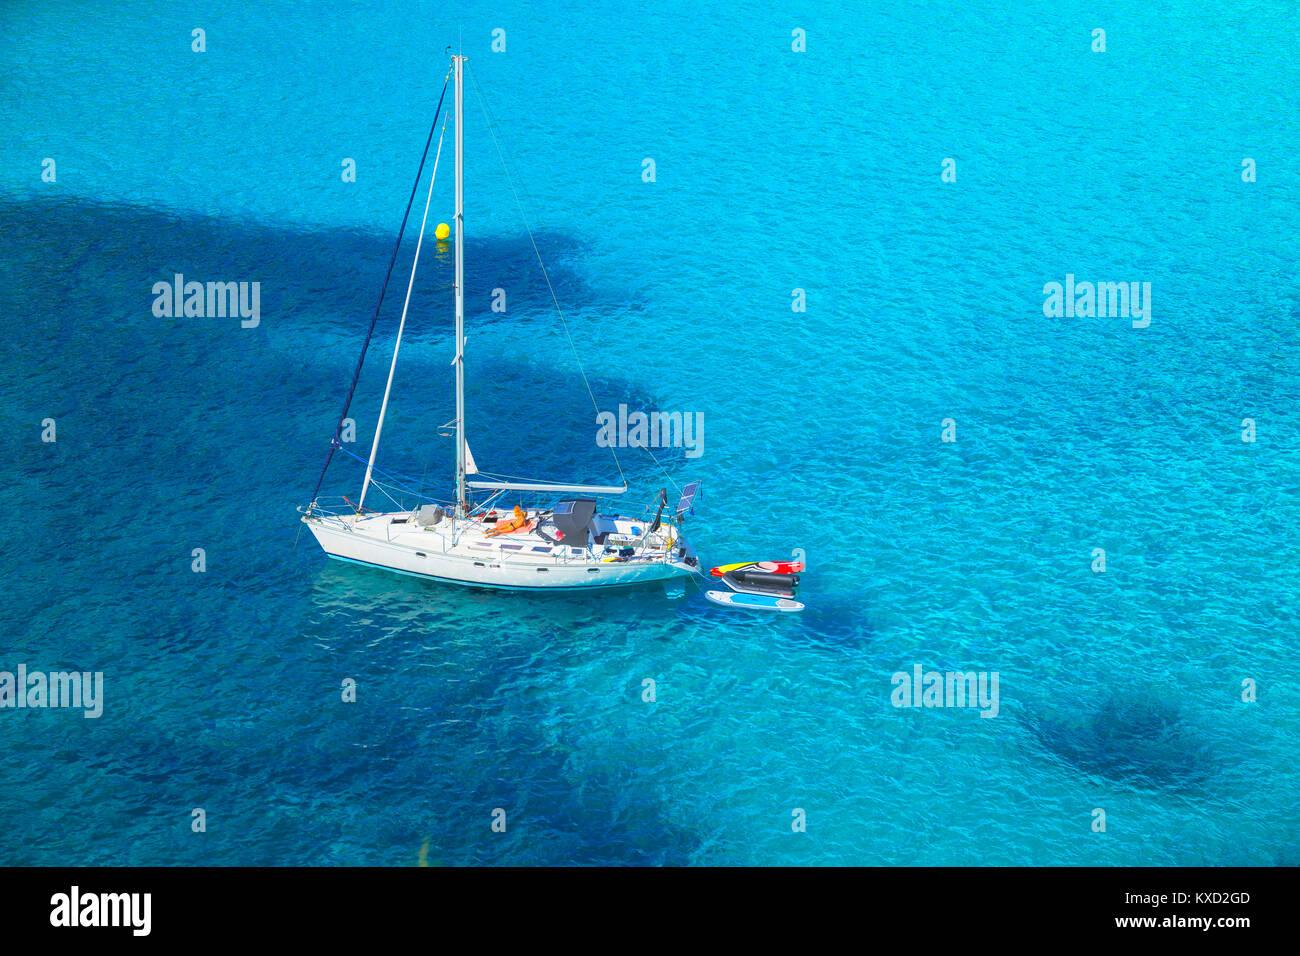 Vista de Cala Macarella y velero, Menorca, Islas Baleares, España Imagen De Stock